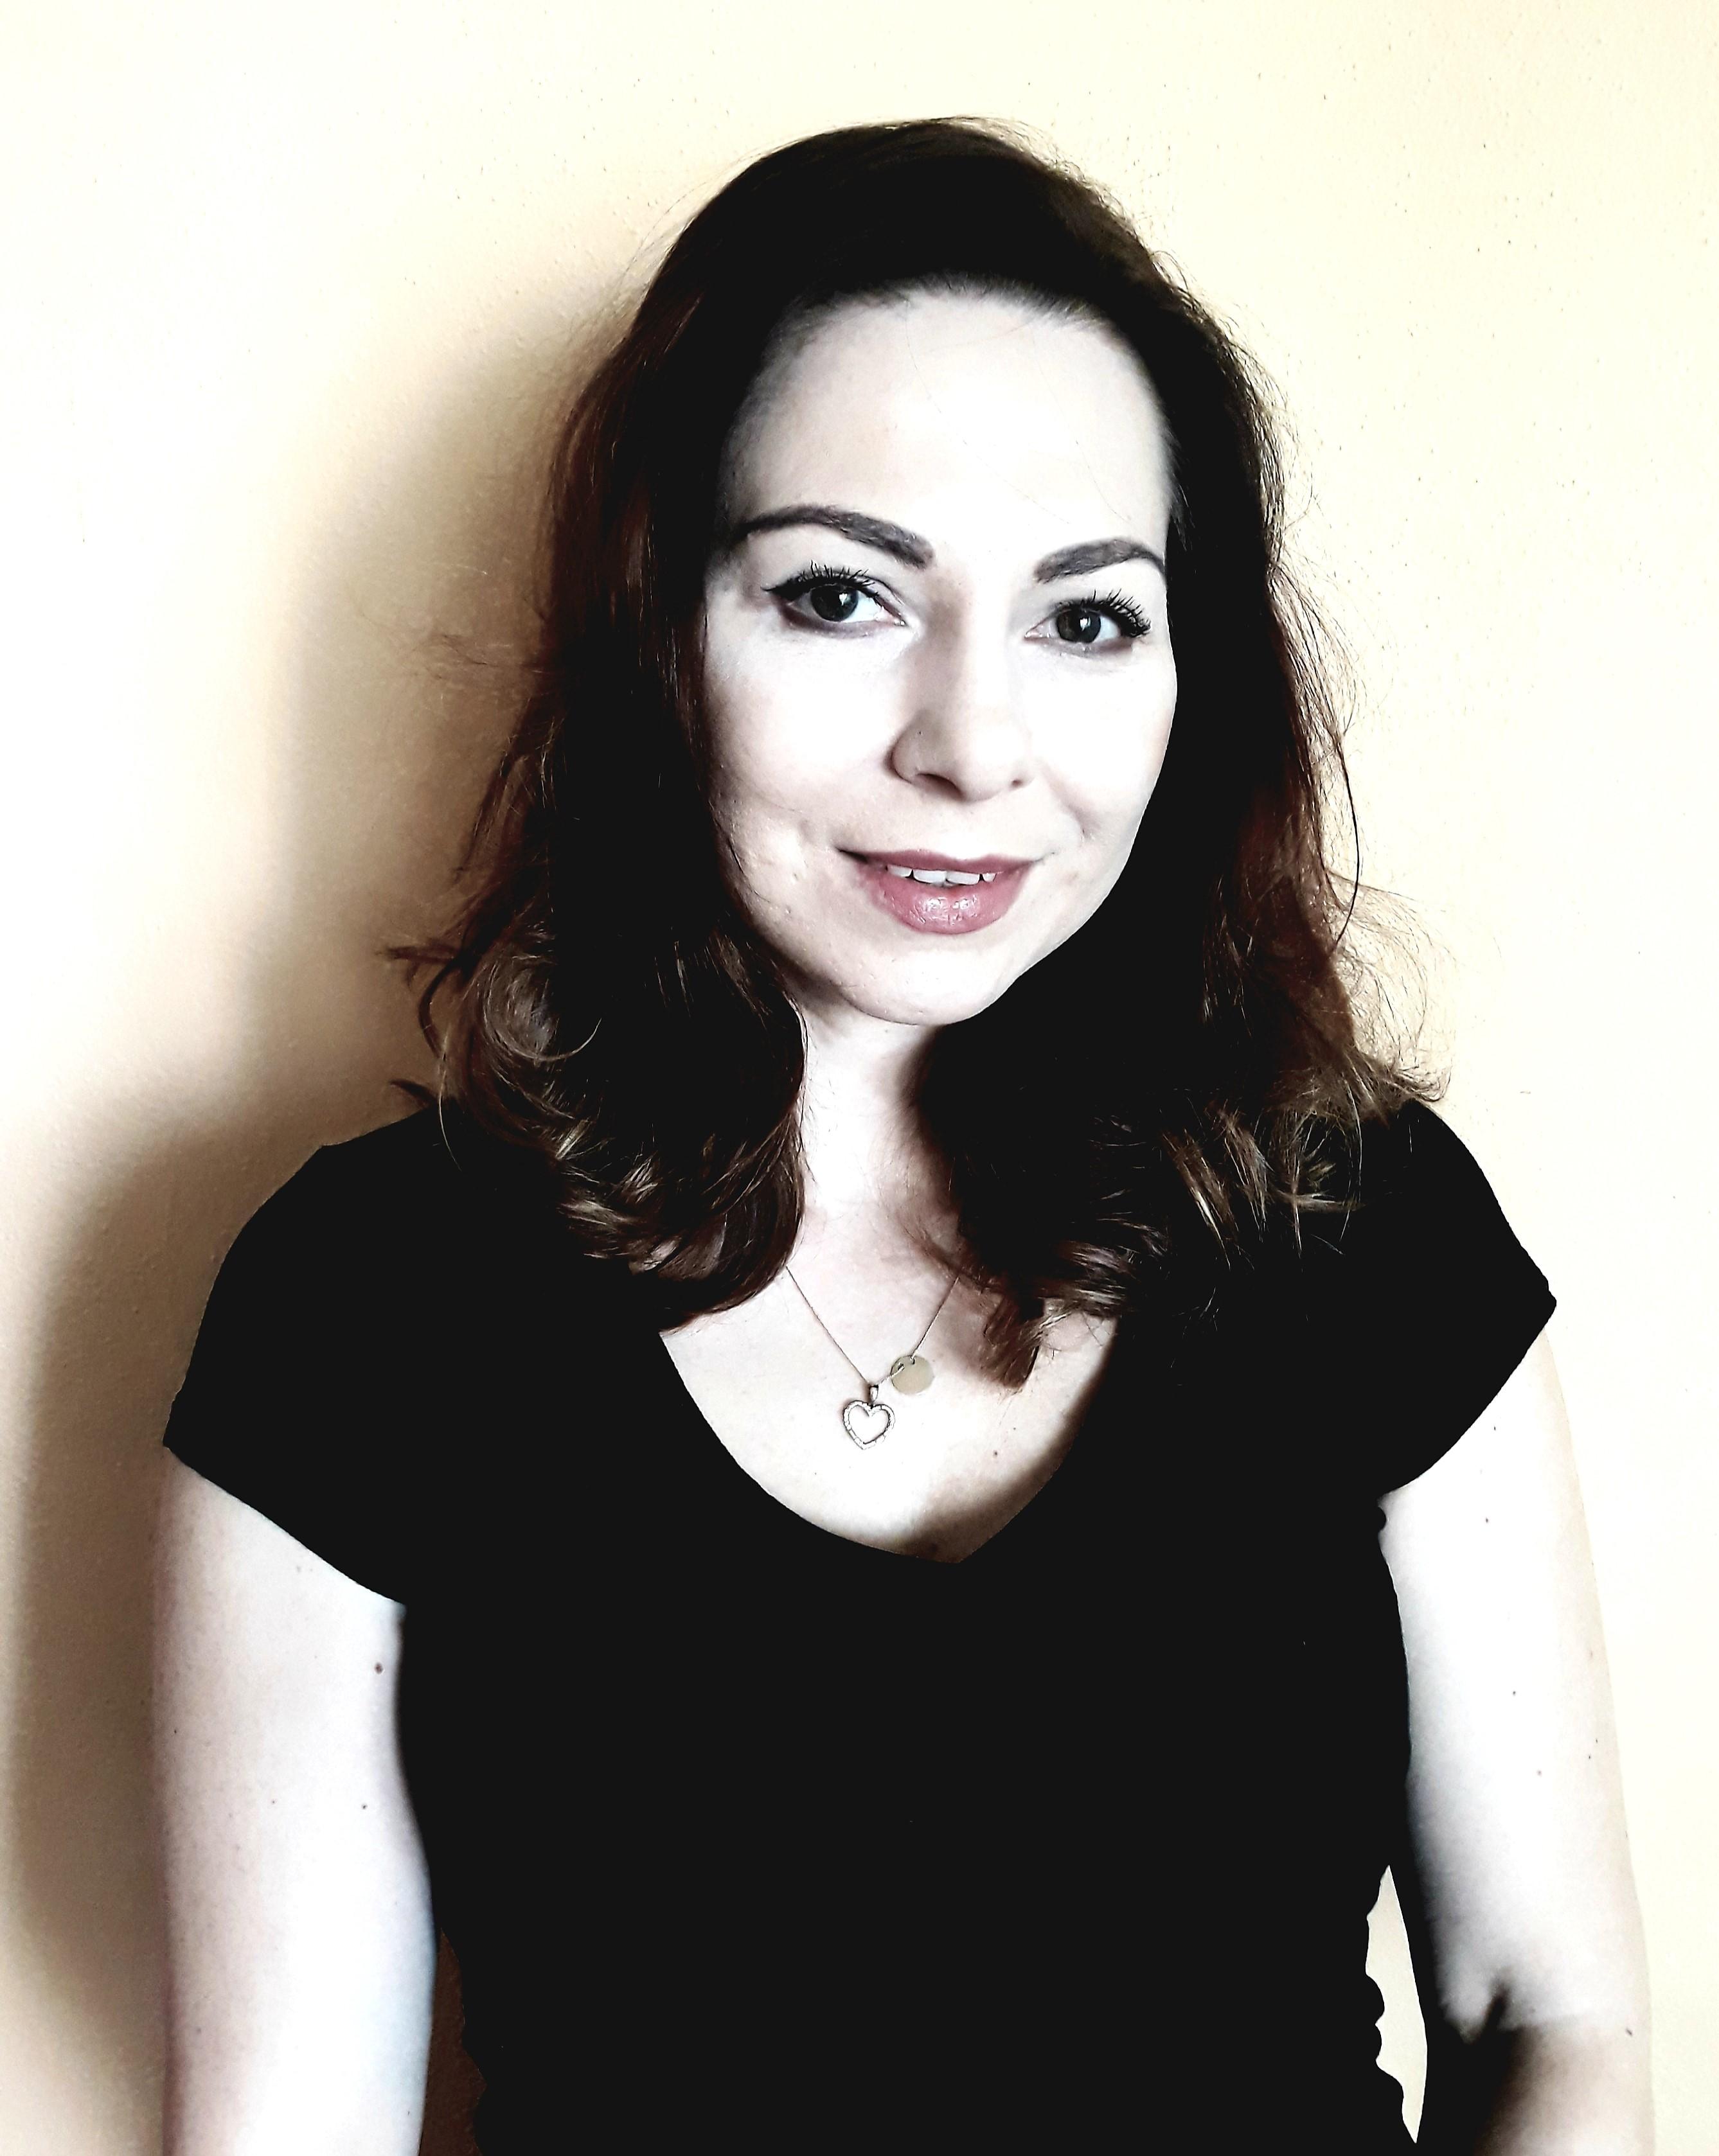 Barbara Gołębiowska